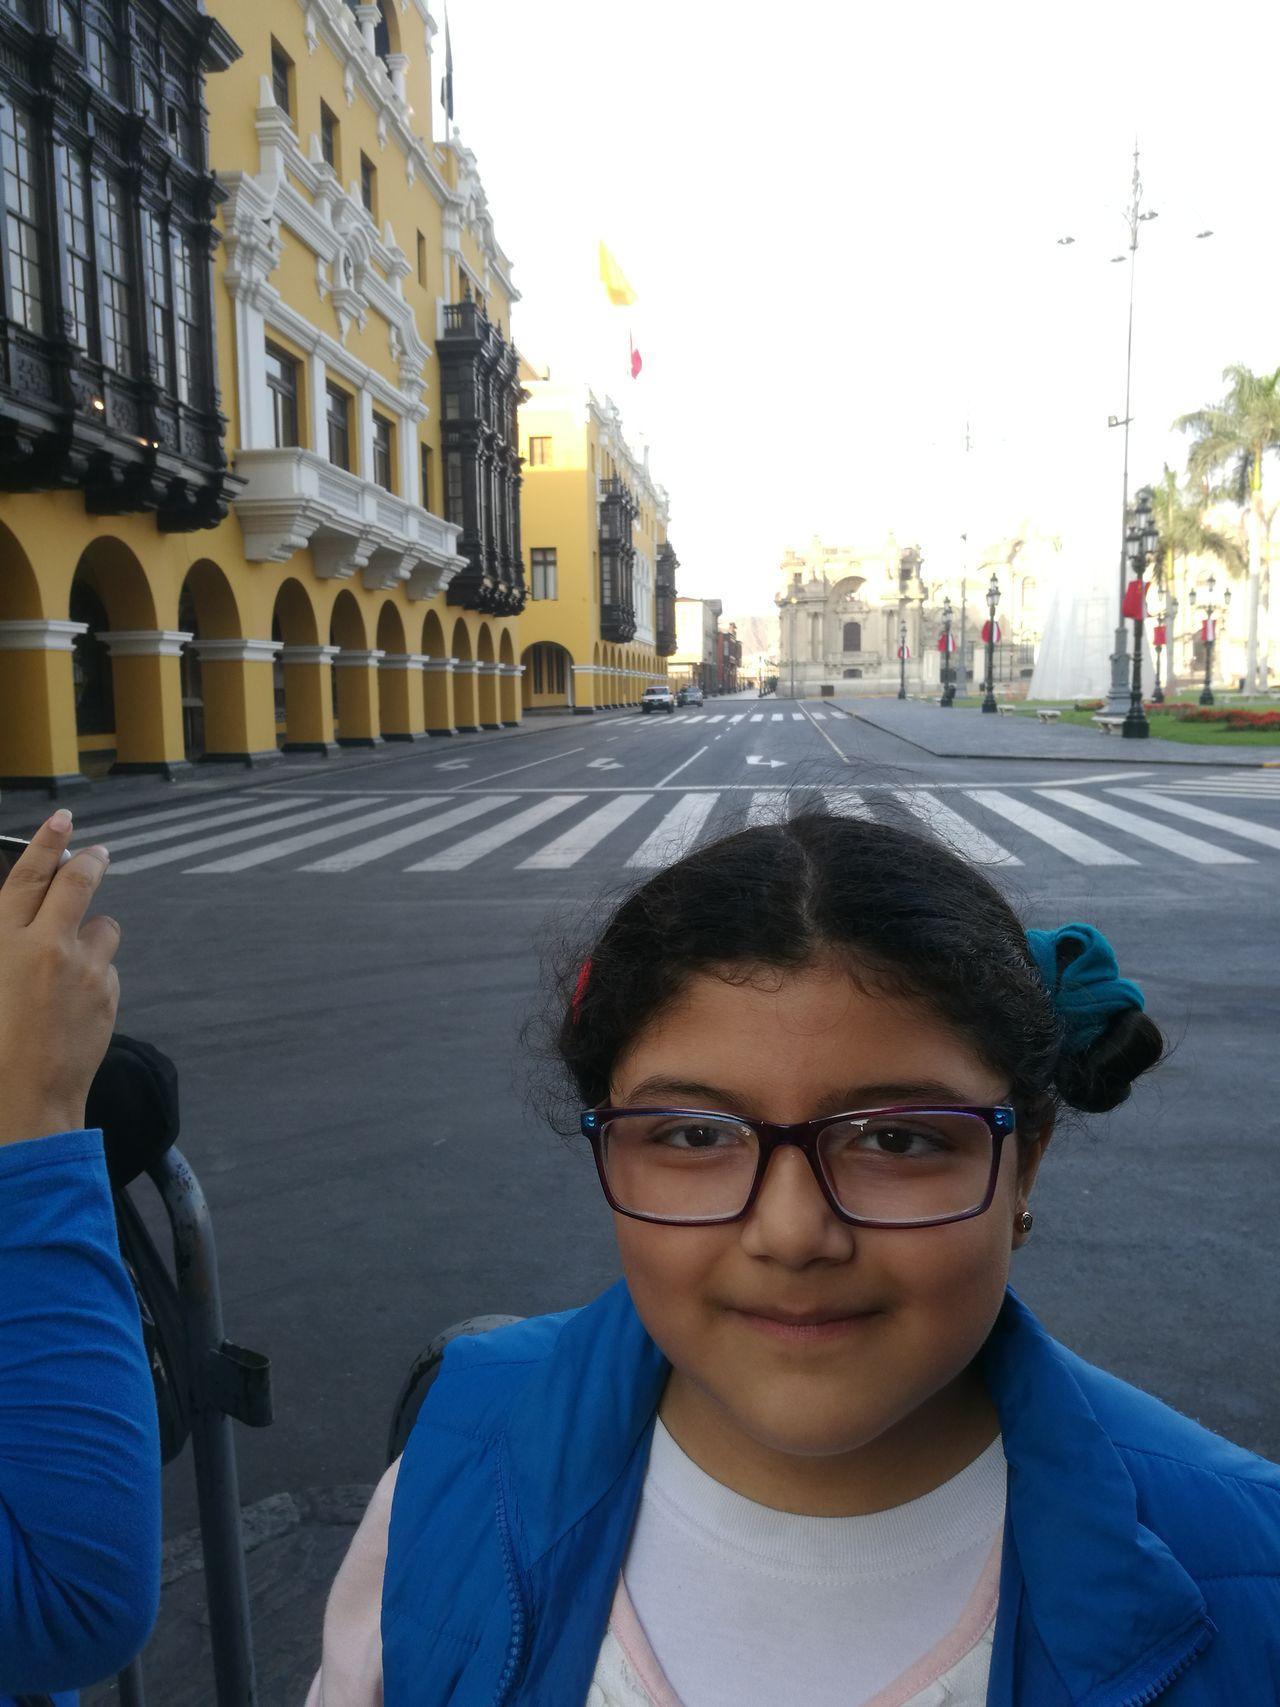 Municipalidad De Lima En Plaza De Armas De L